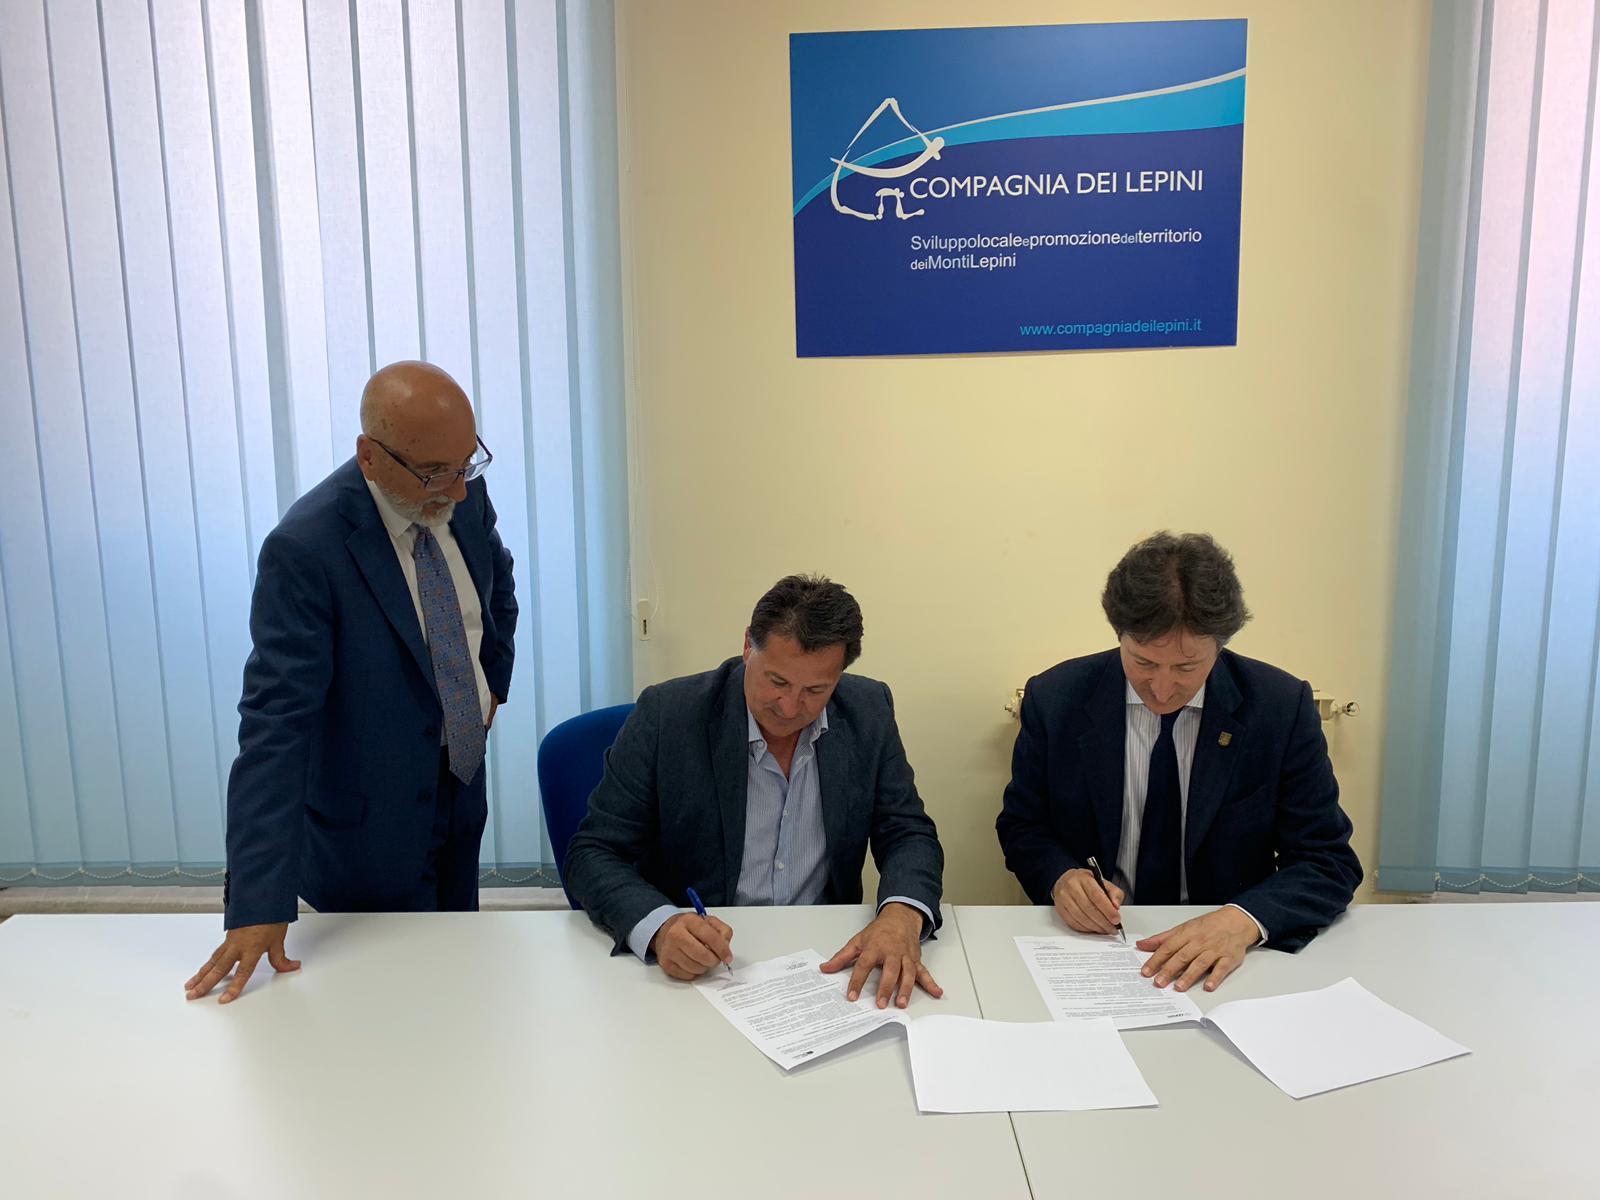 firma-protocollo-intesa-compagnia-dei-lepini-e-film-commission-1